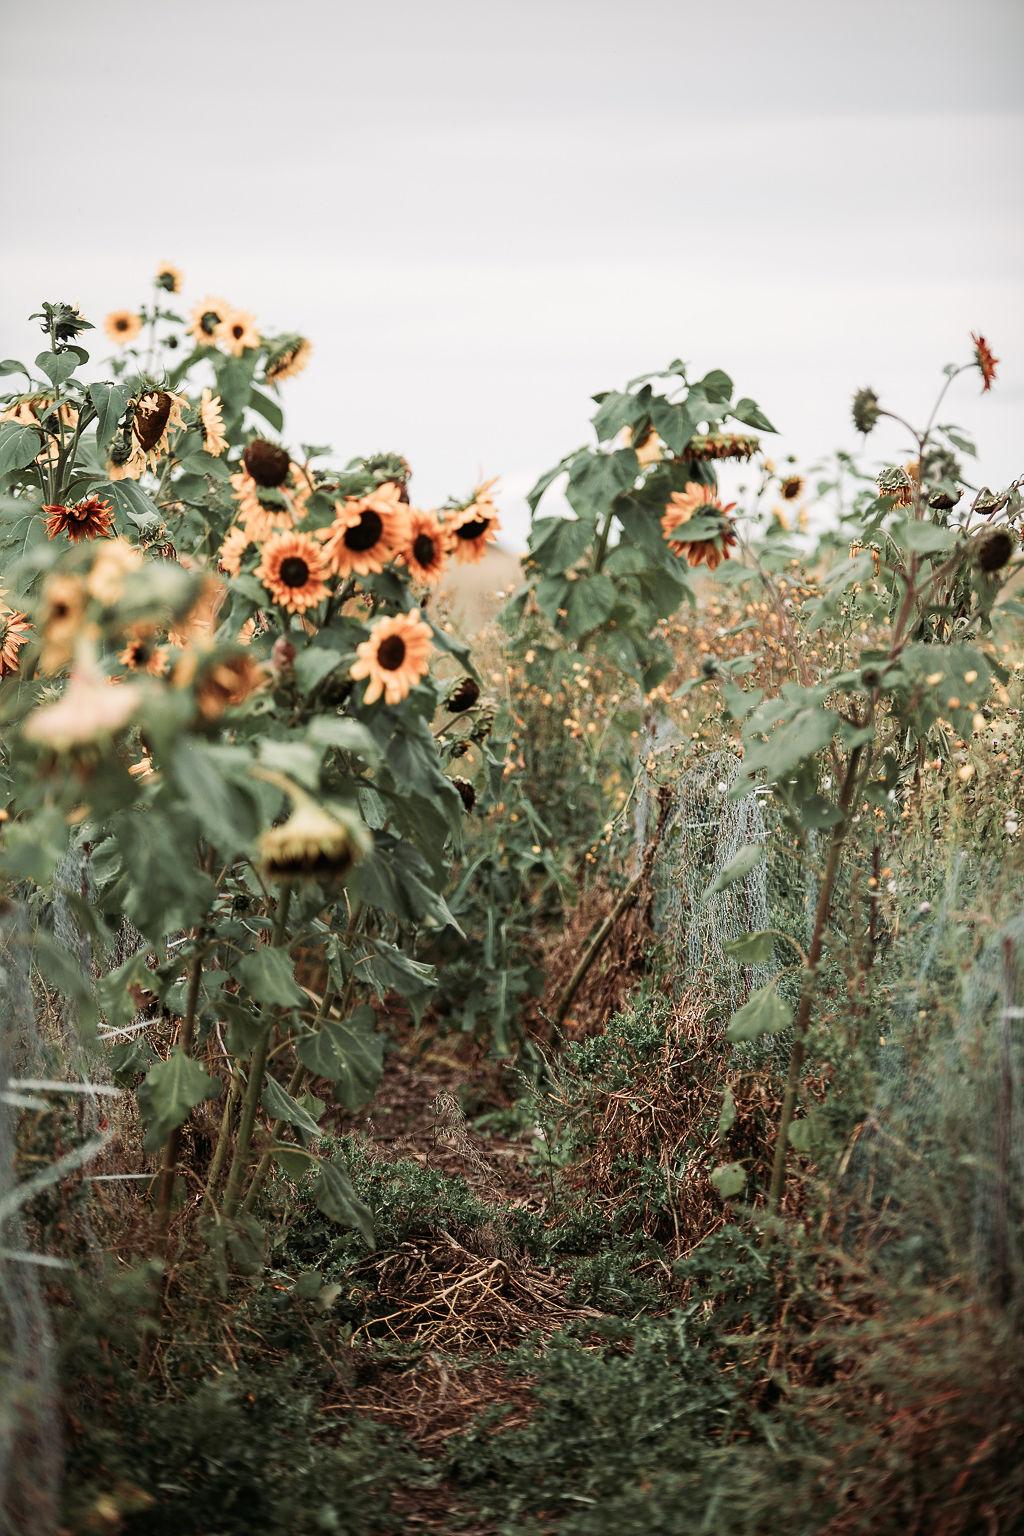 sunflower garden at the end of a season